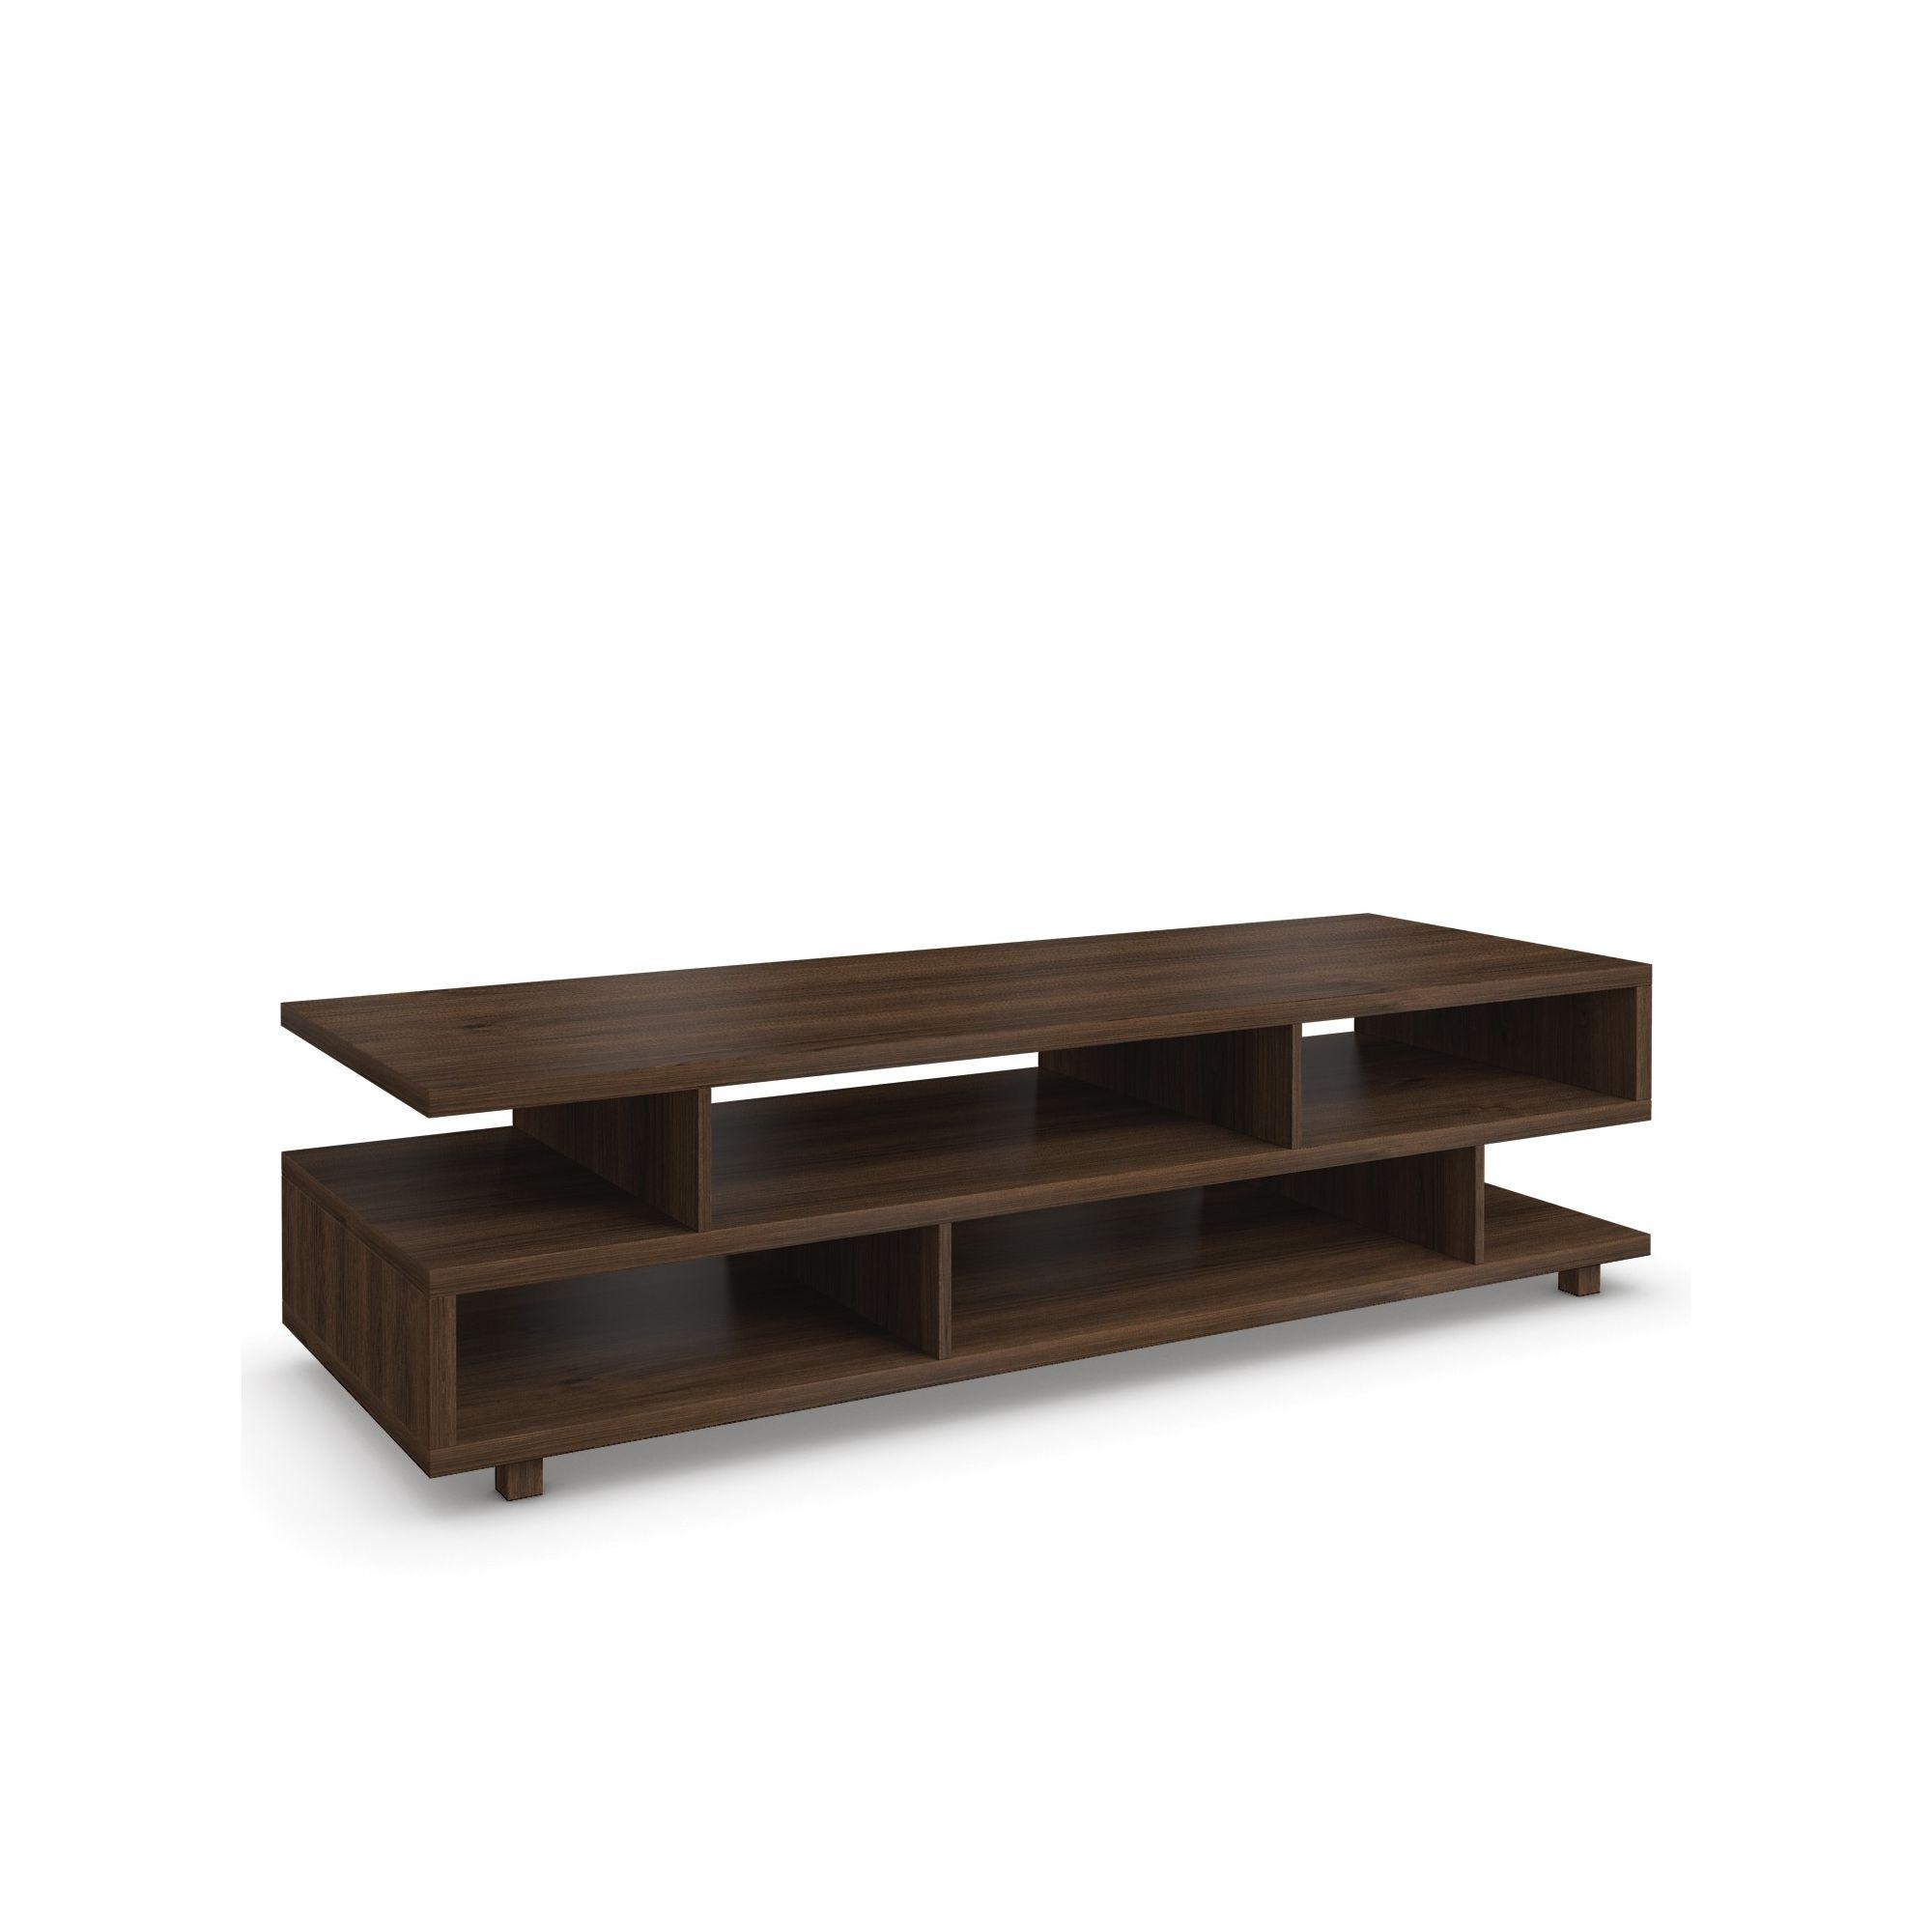 Urbane Designs Hadlee Contemporary Walnut Livingroom Small Asymmetric Shelf at Tesco Direct